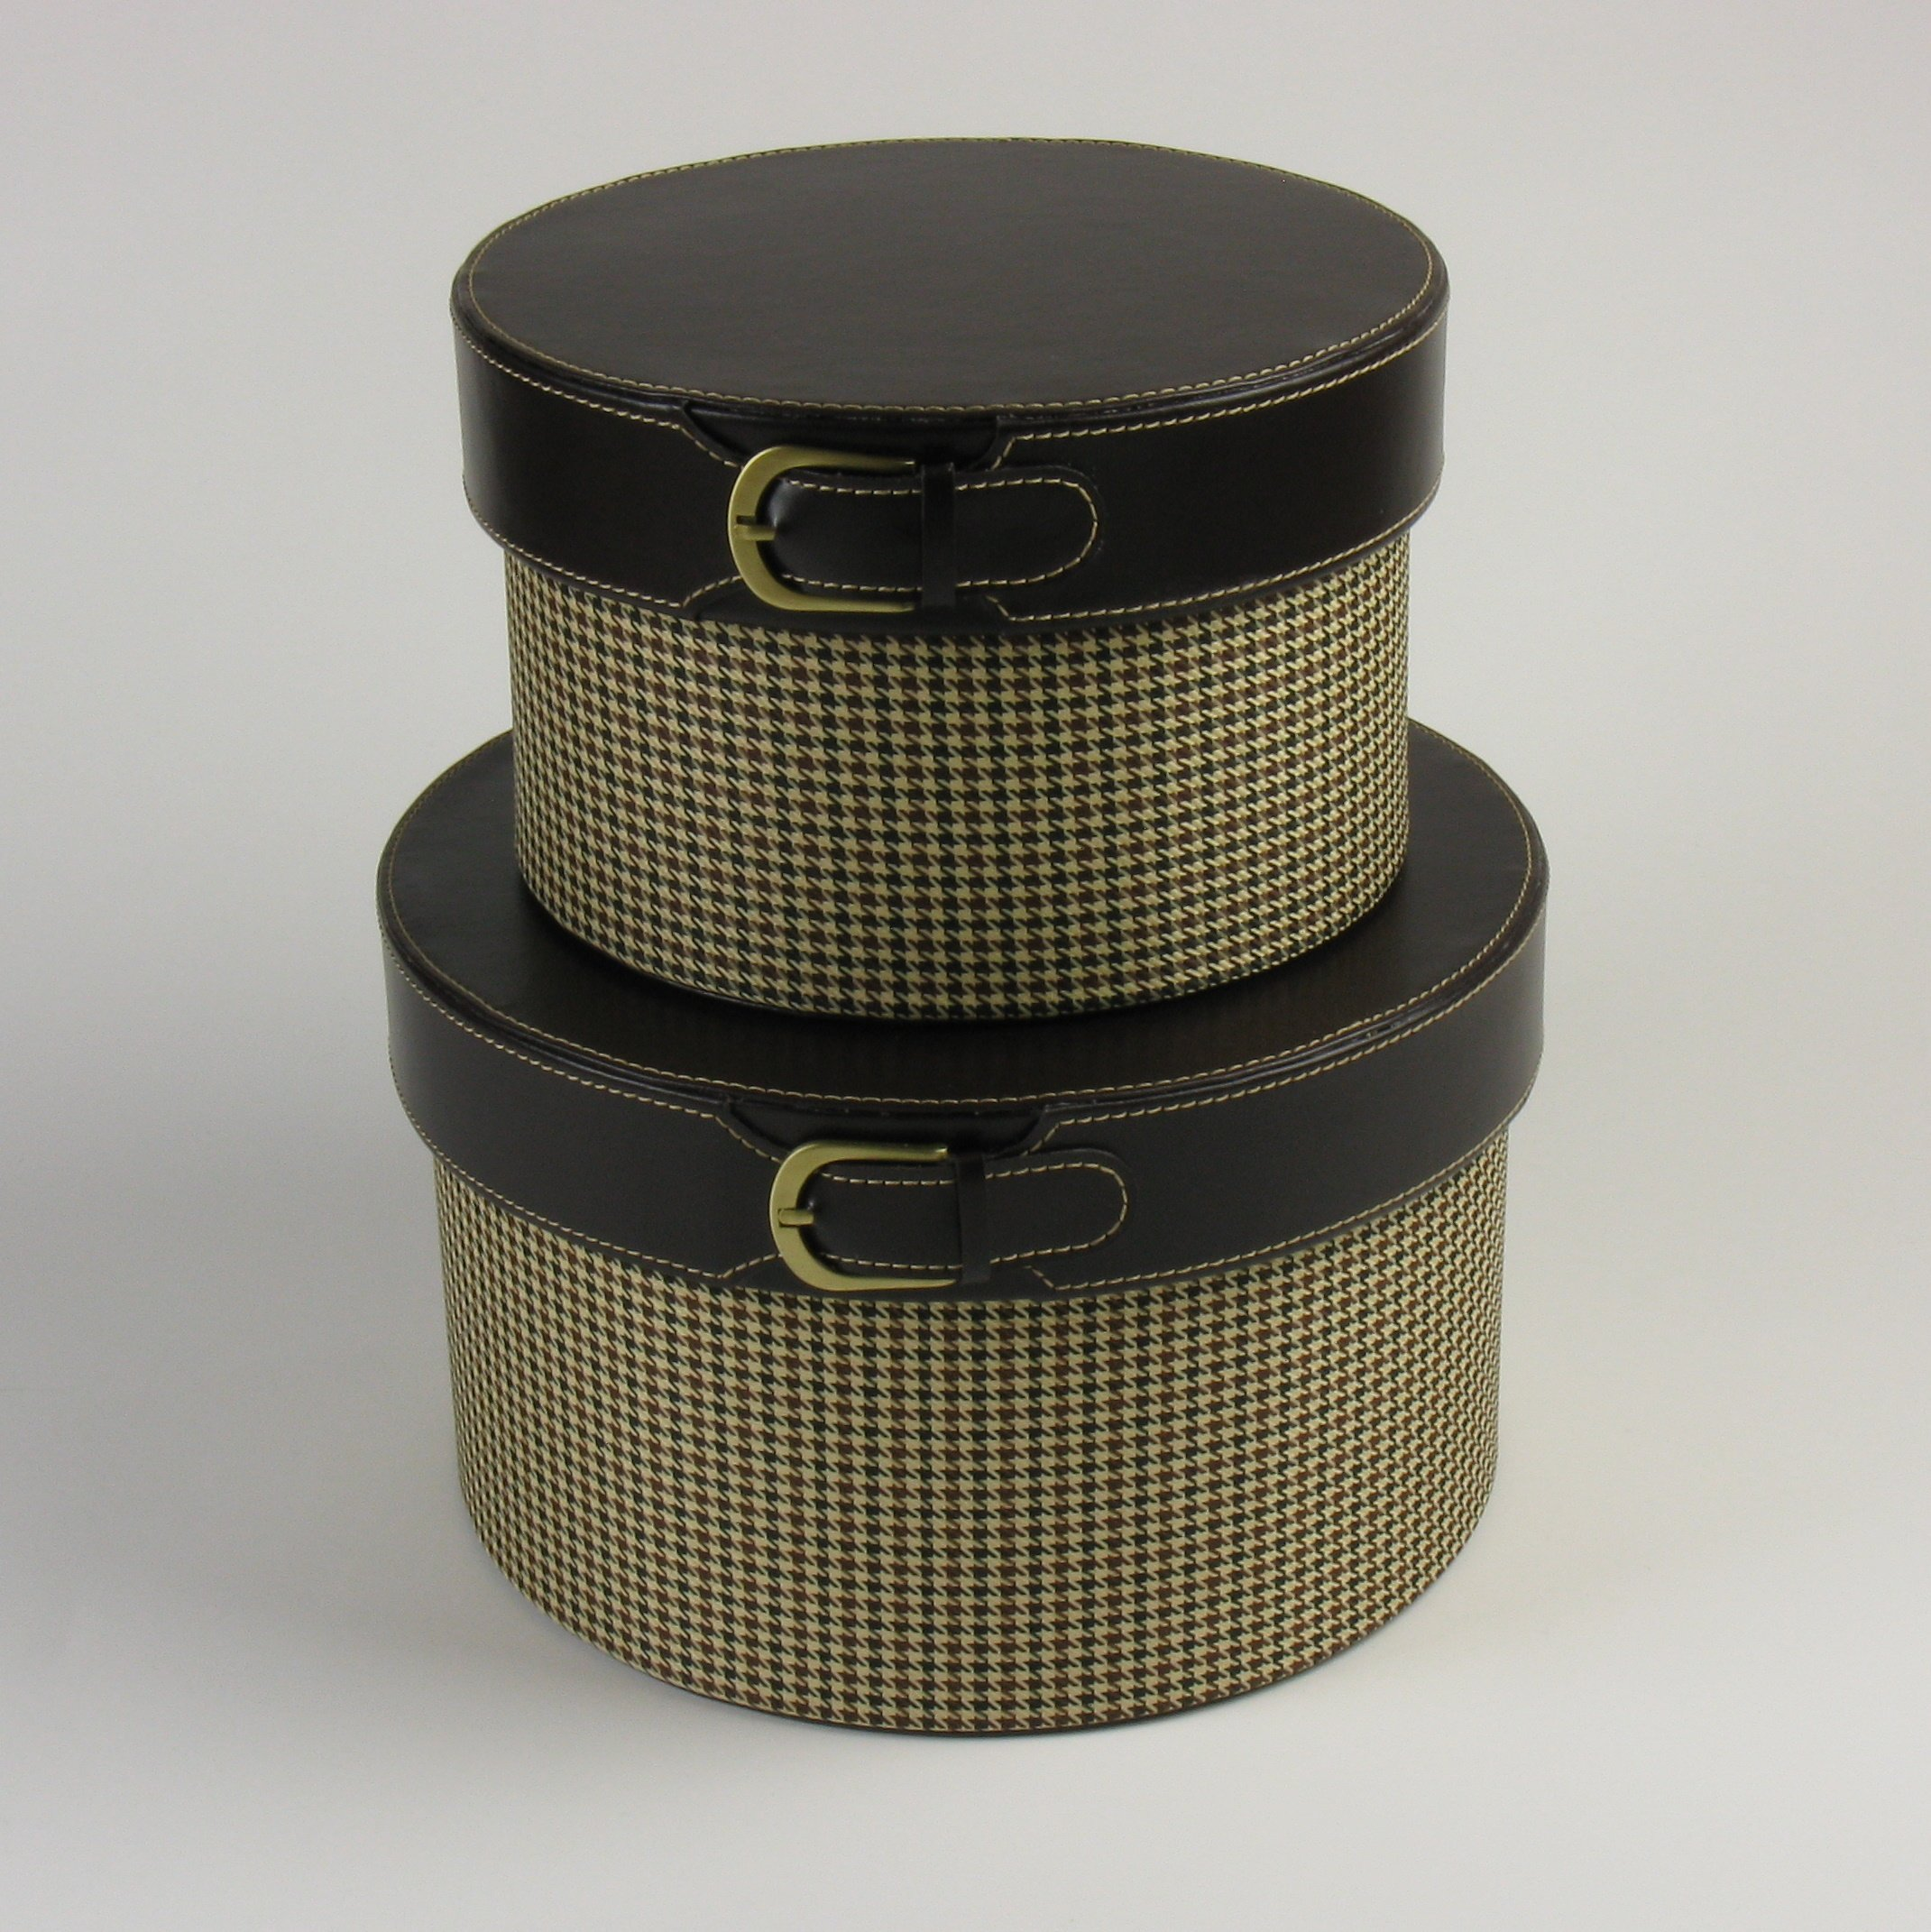 Sombrereras HYB - Set de 2: Amazon.es: Hogar